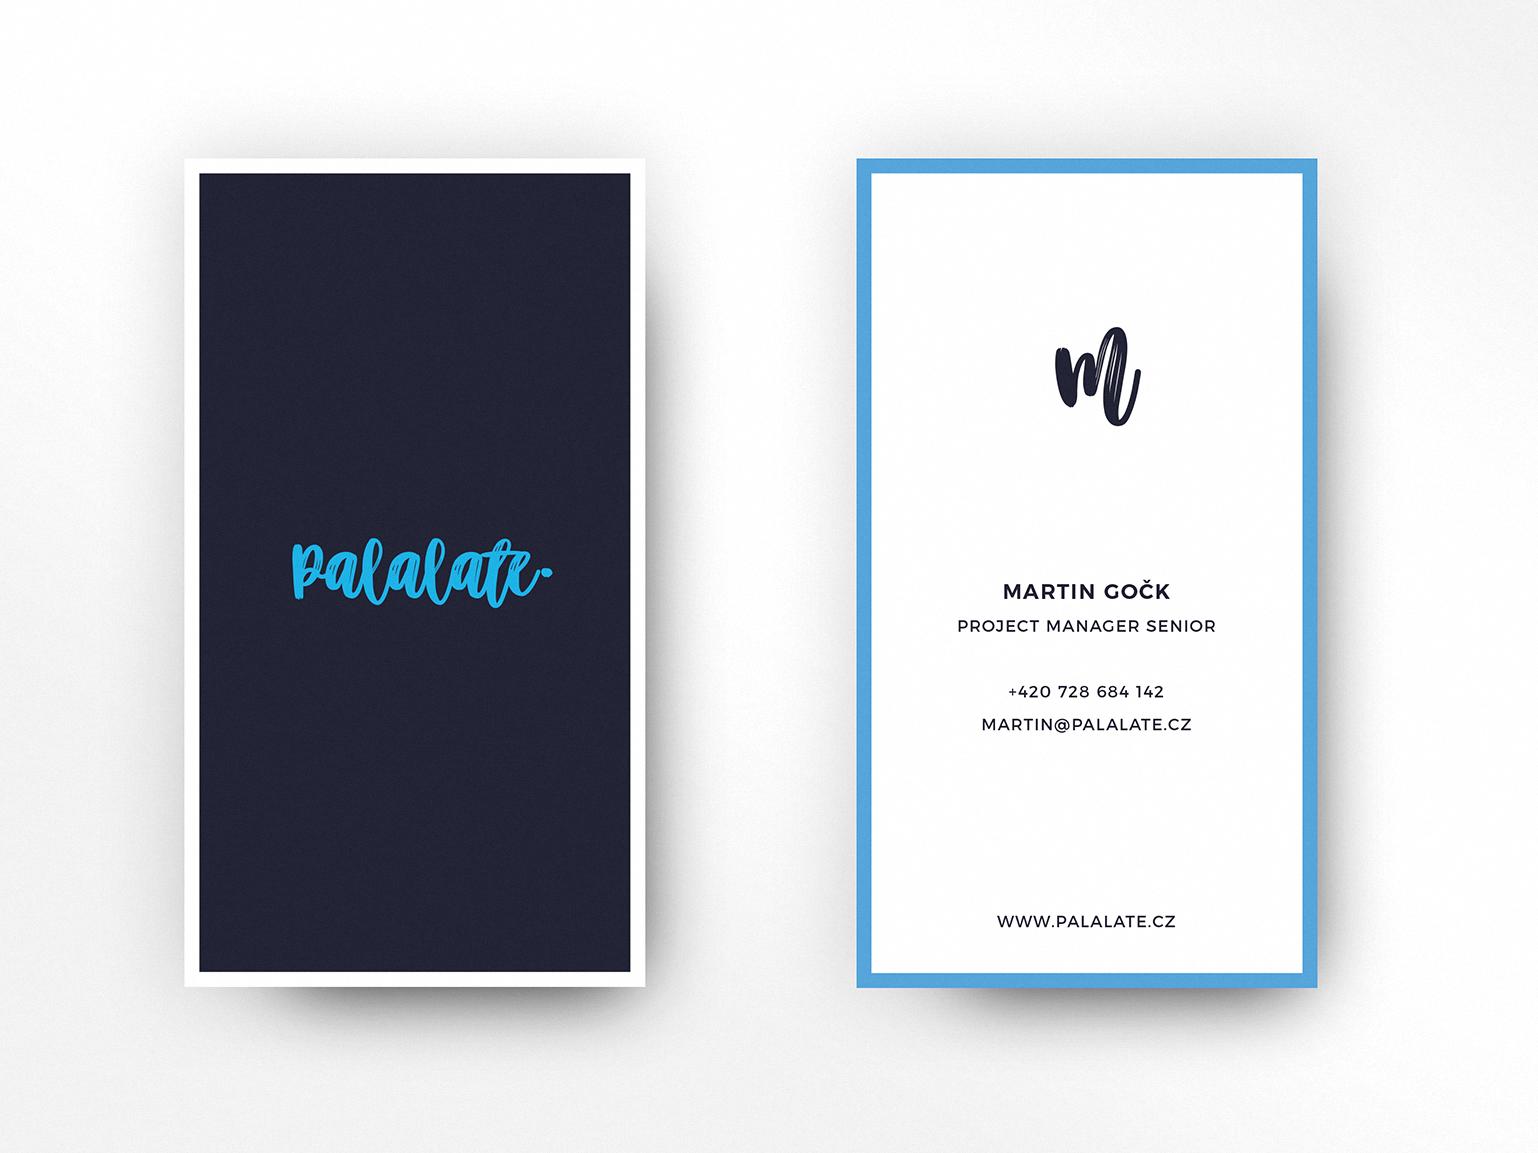 Palalate Business Cards identity card company logo logo design design logo business card